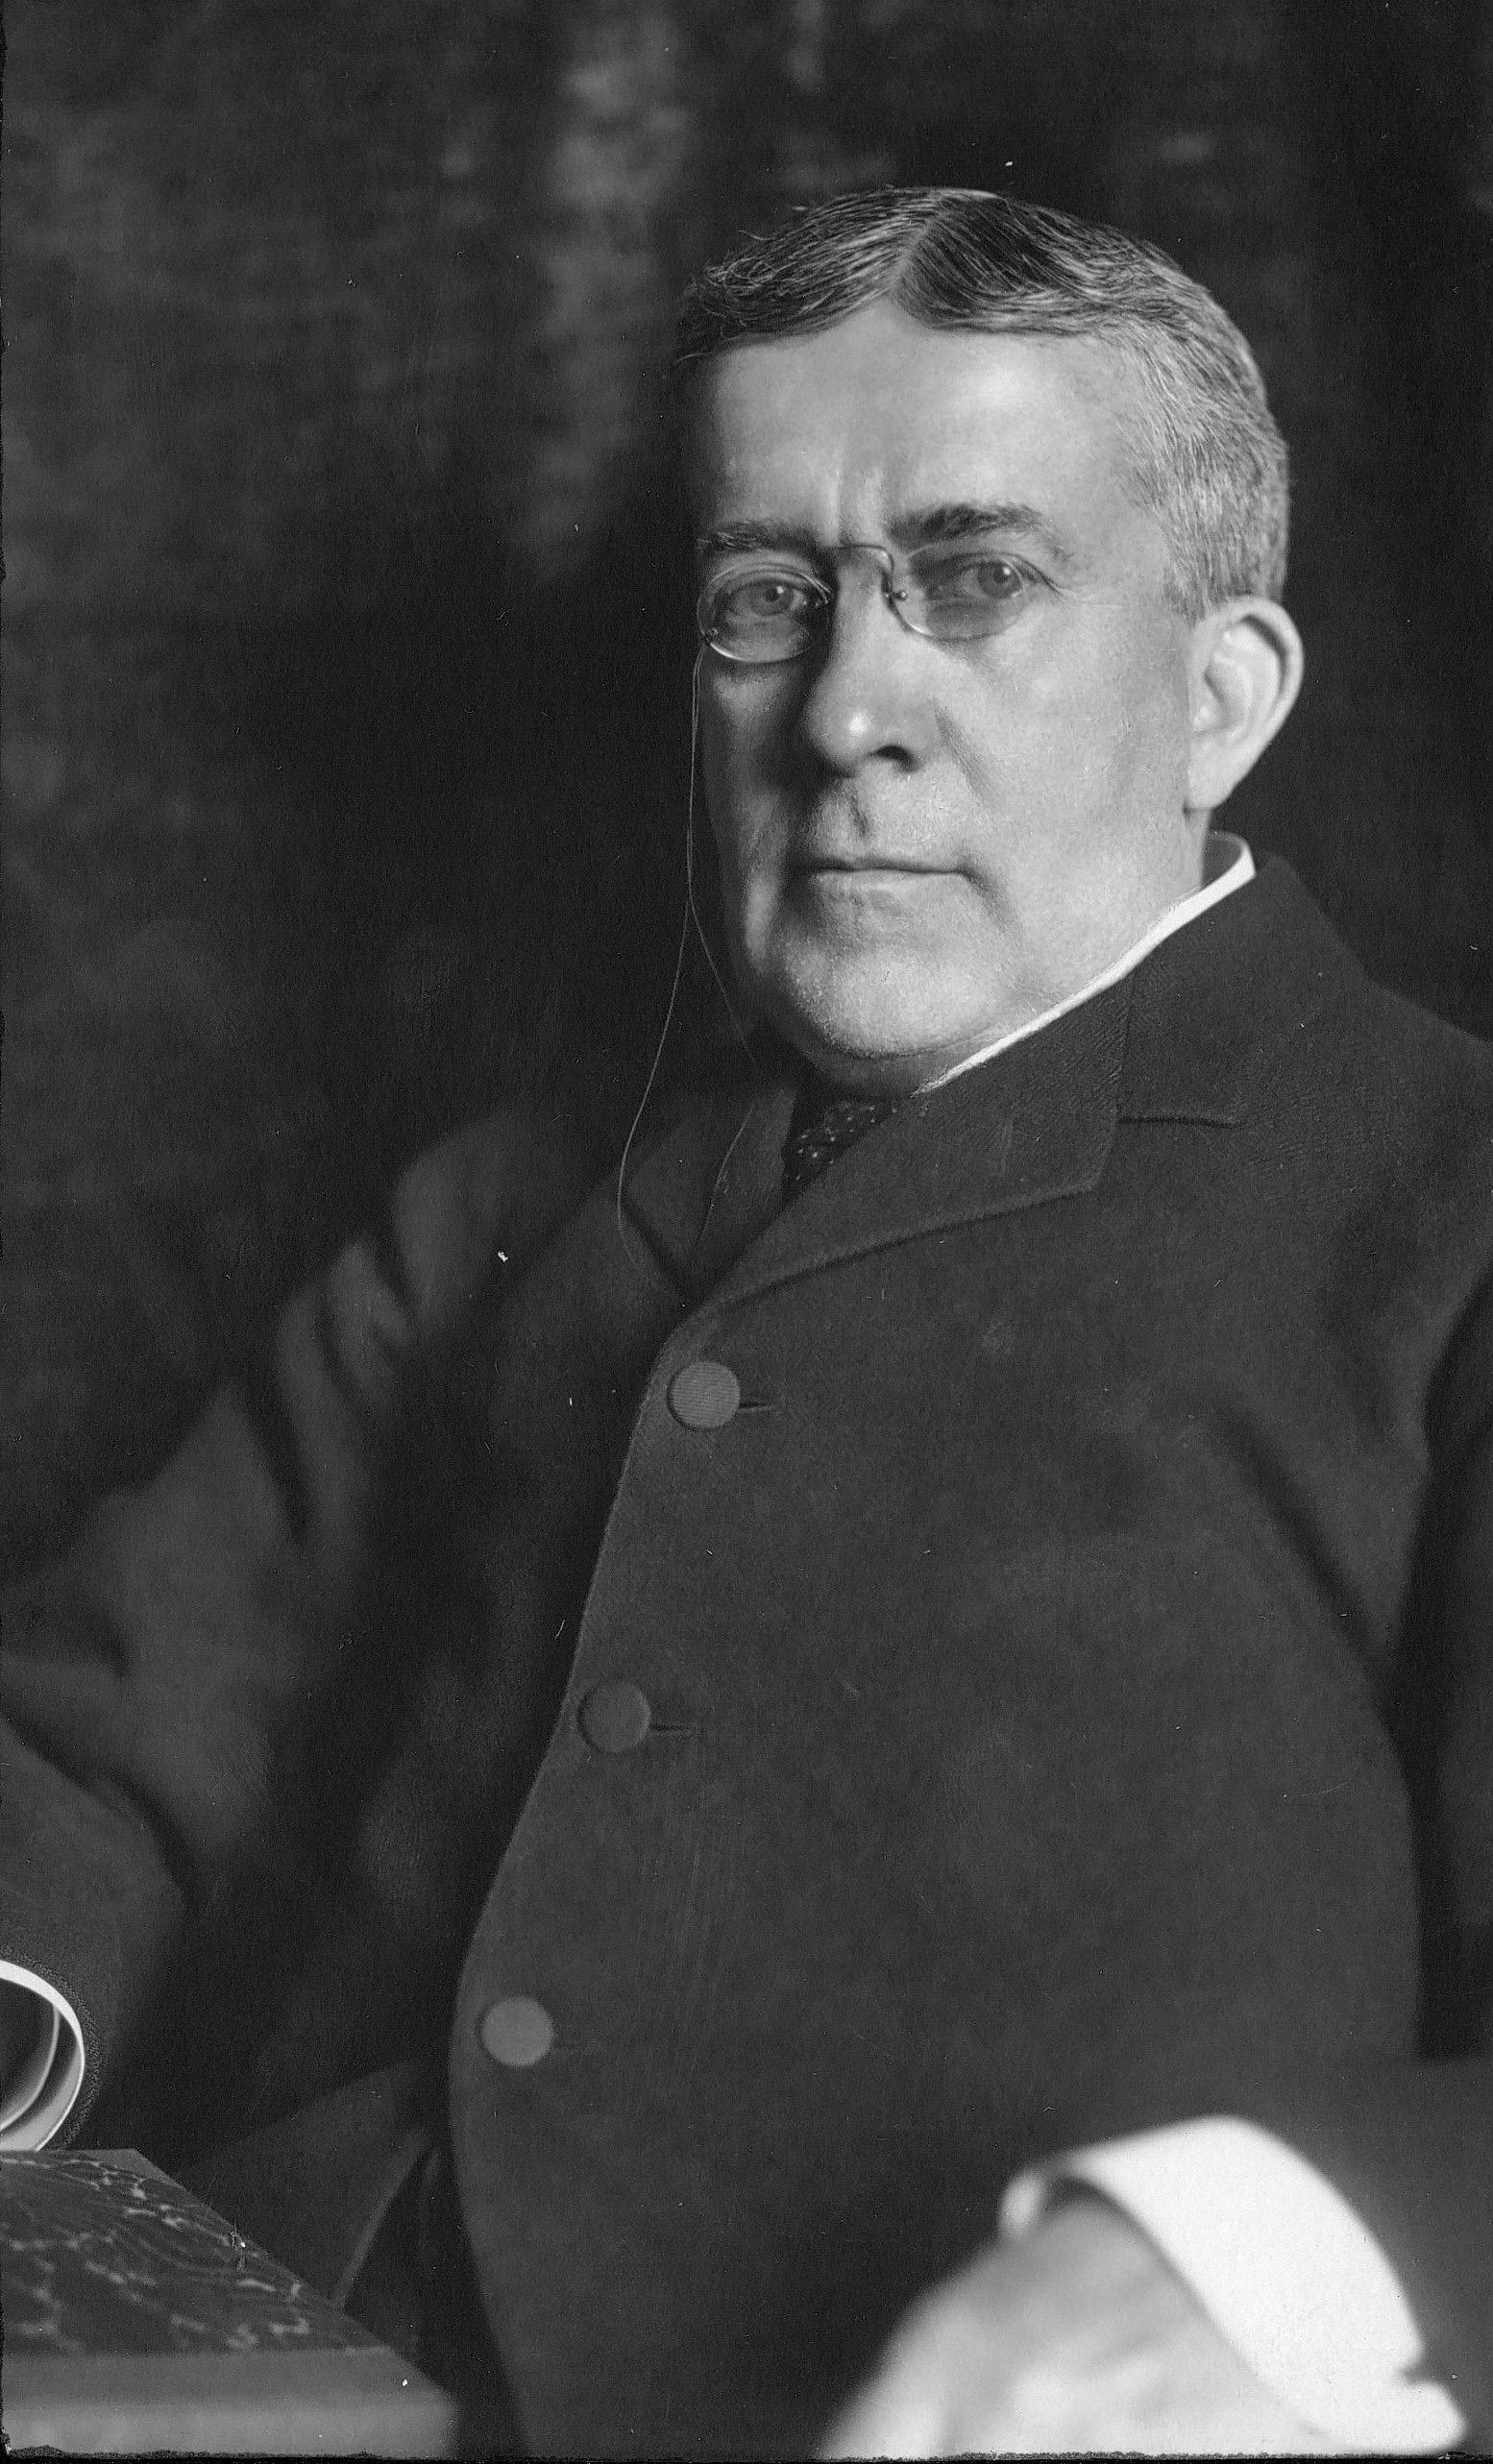 Charles Custis Harrison